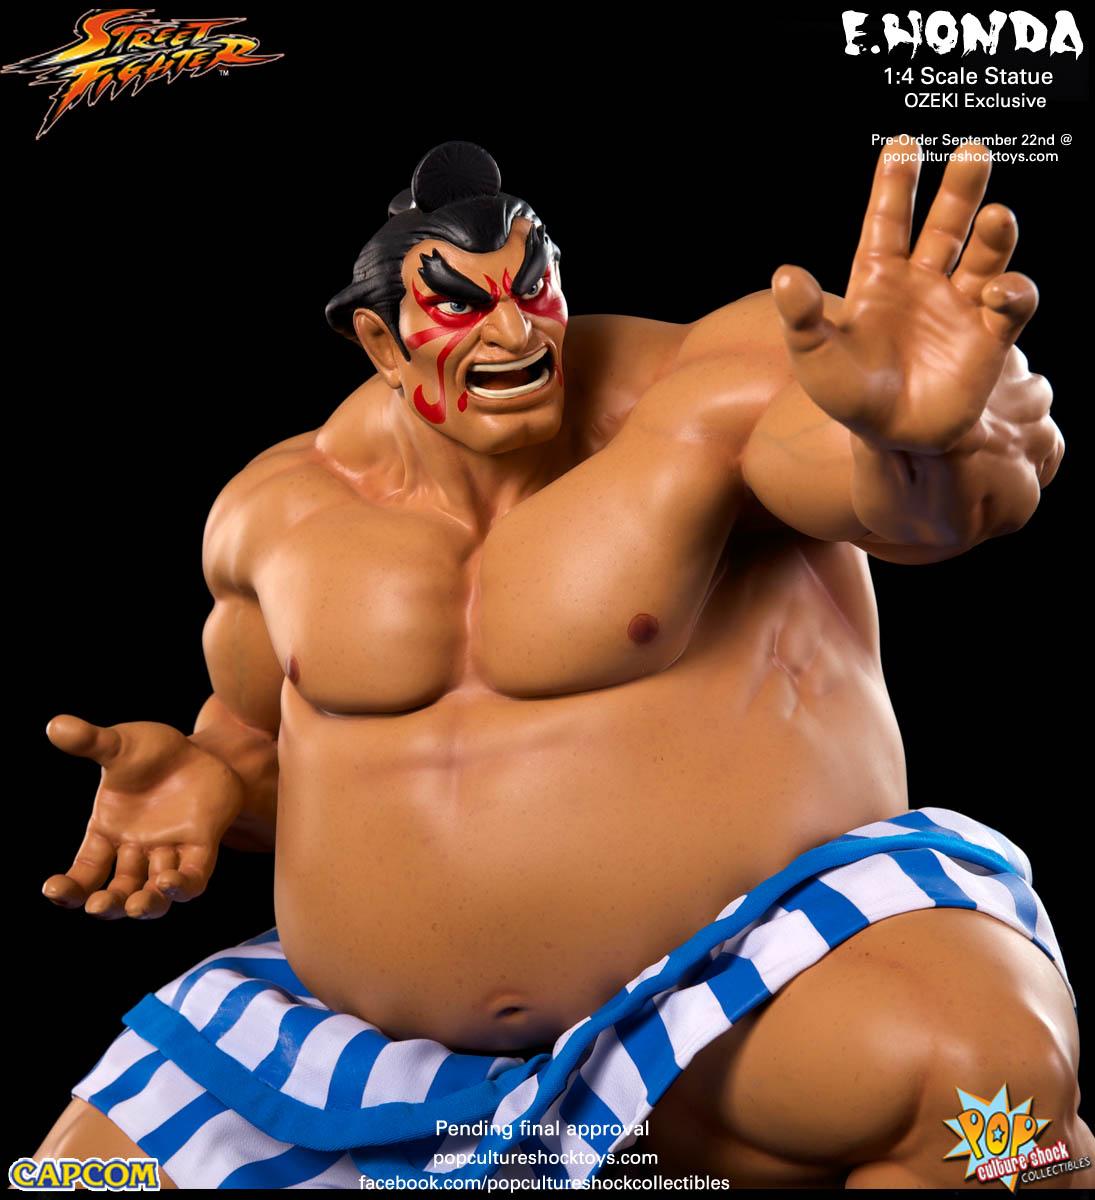 [Pop Culture Shock] Street Fighter: E. Honda 1/4 Statue - Página 3 Street-Fighter-E.-Honda-ozeki-Statue-011